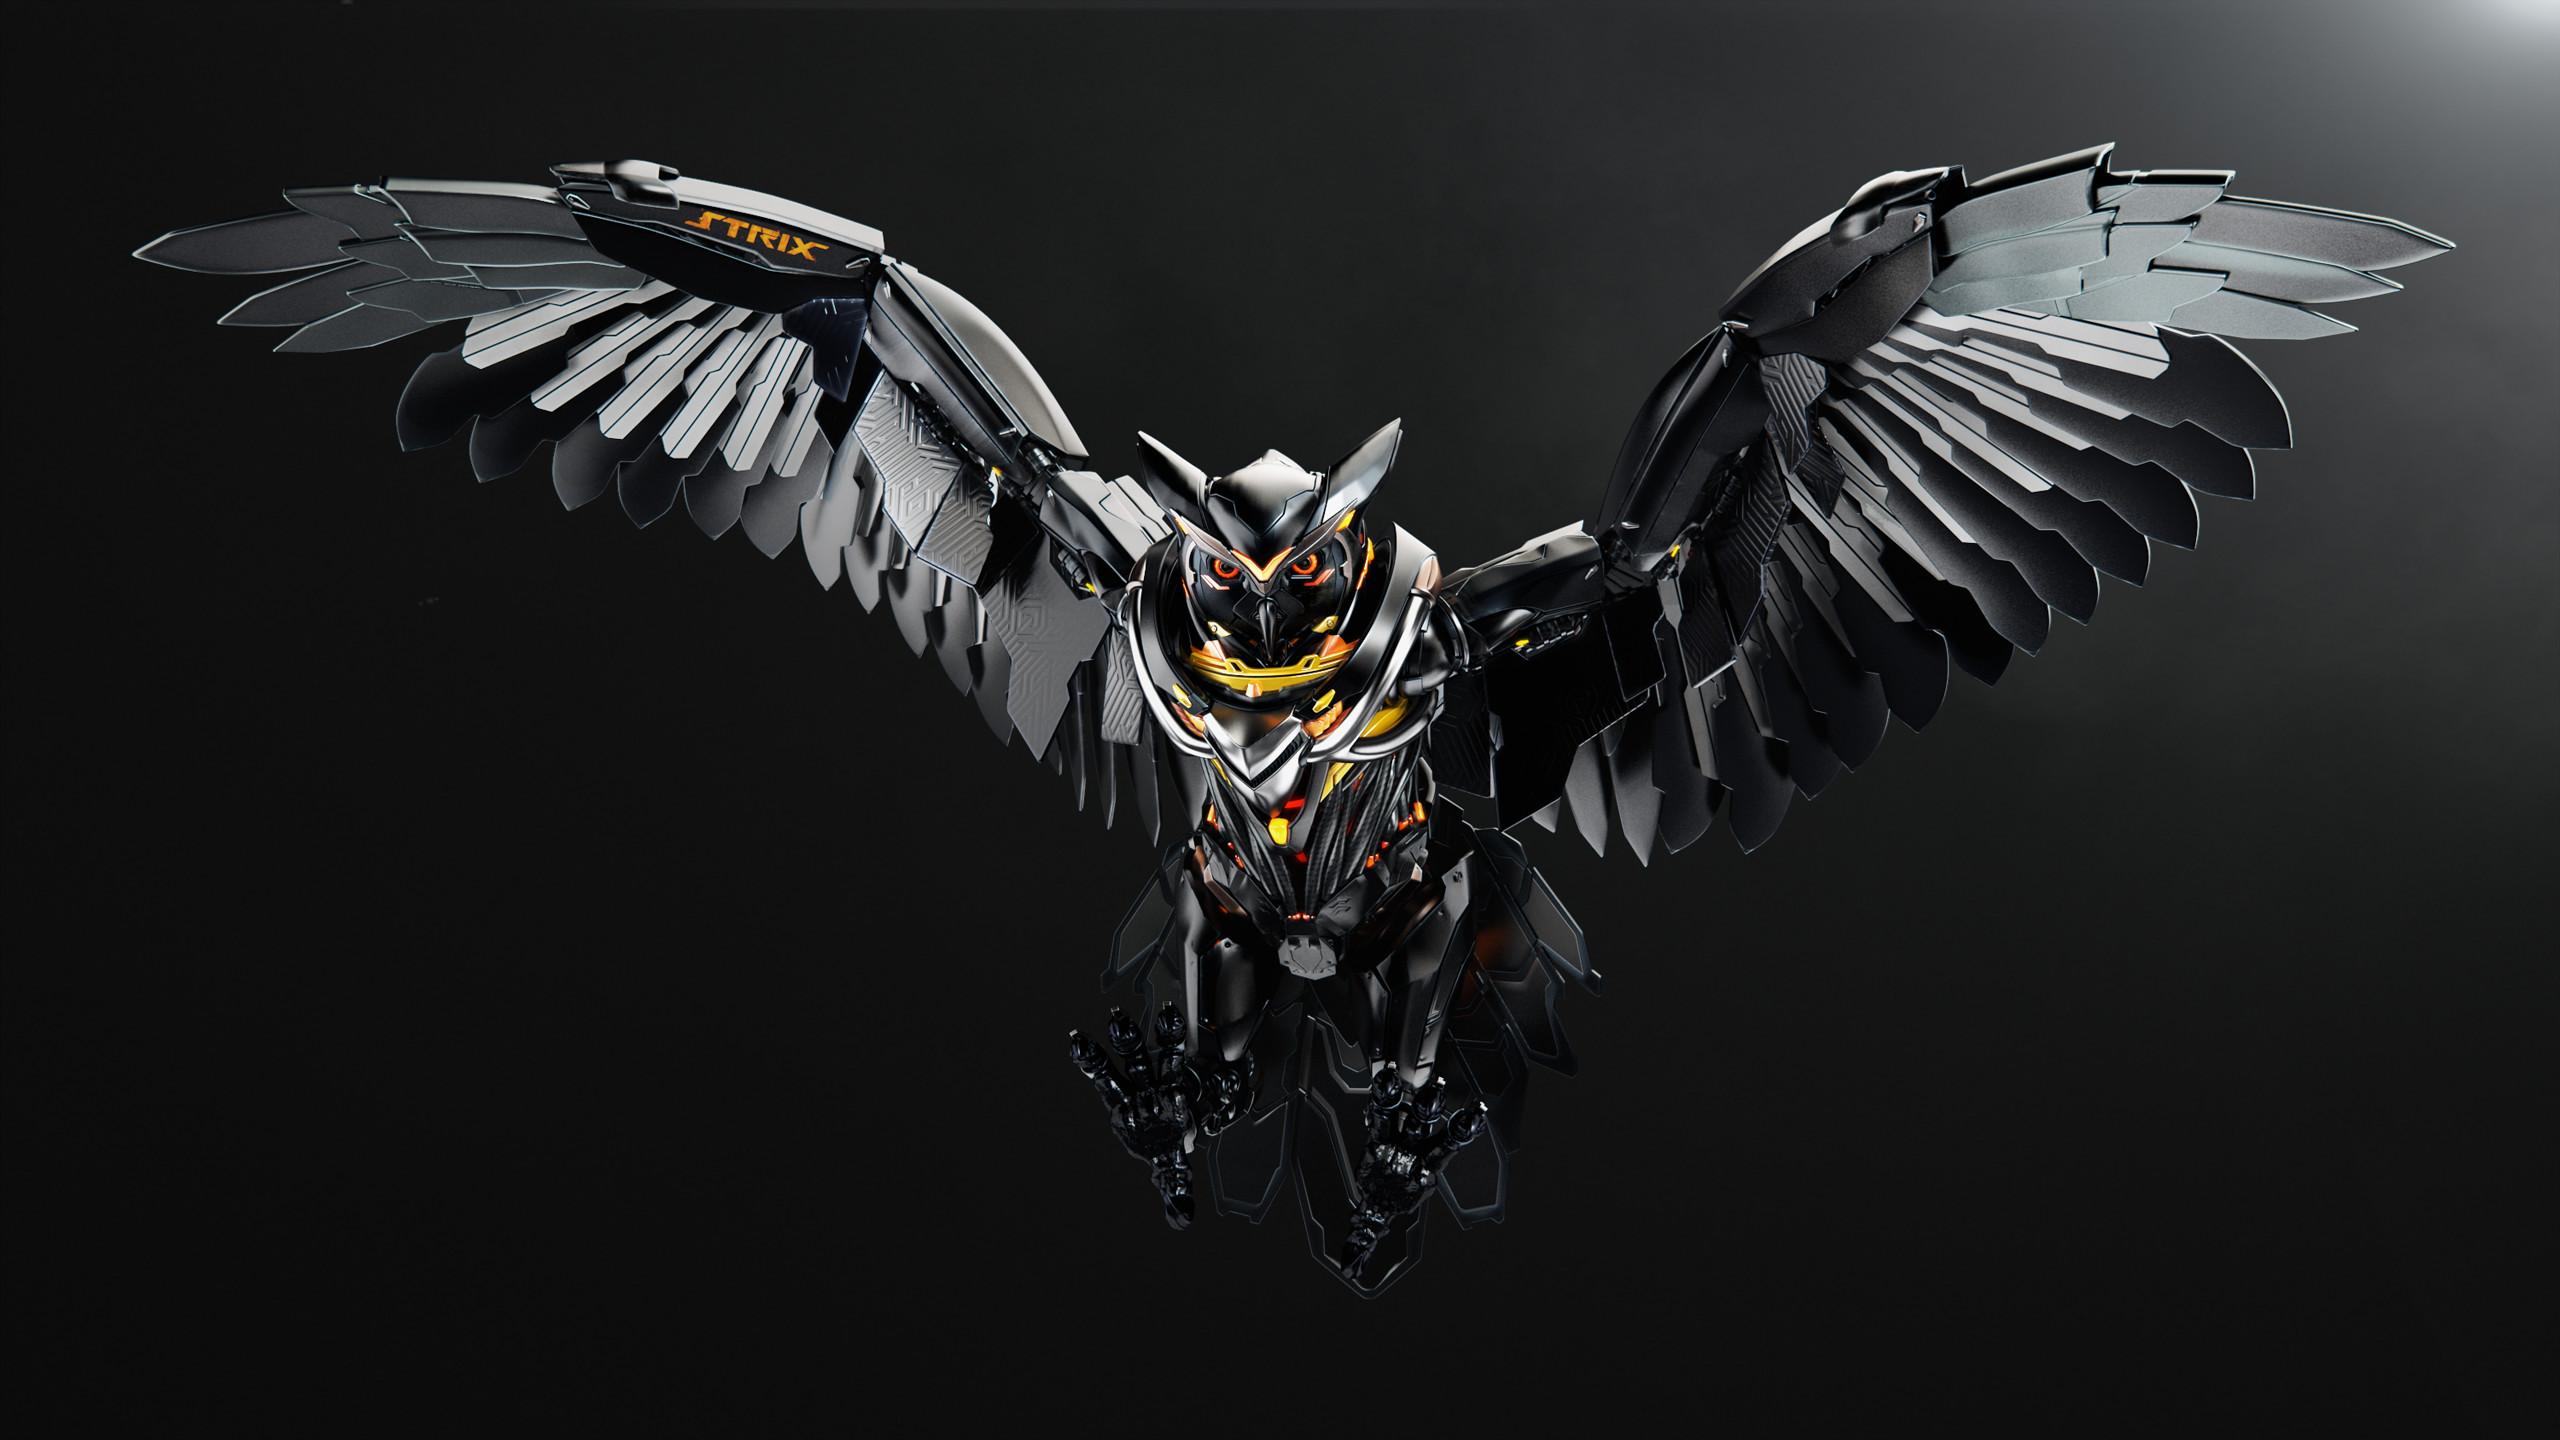 DownloadStrix Owl Wallpaper